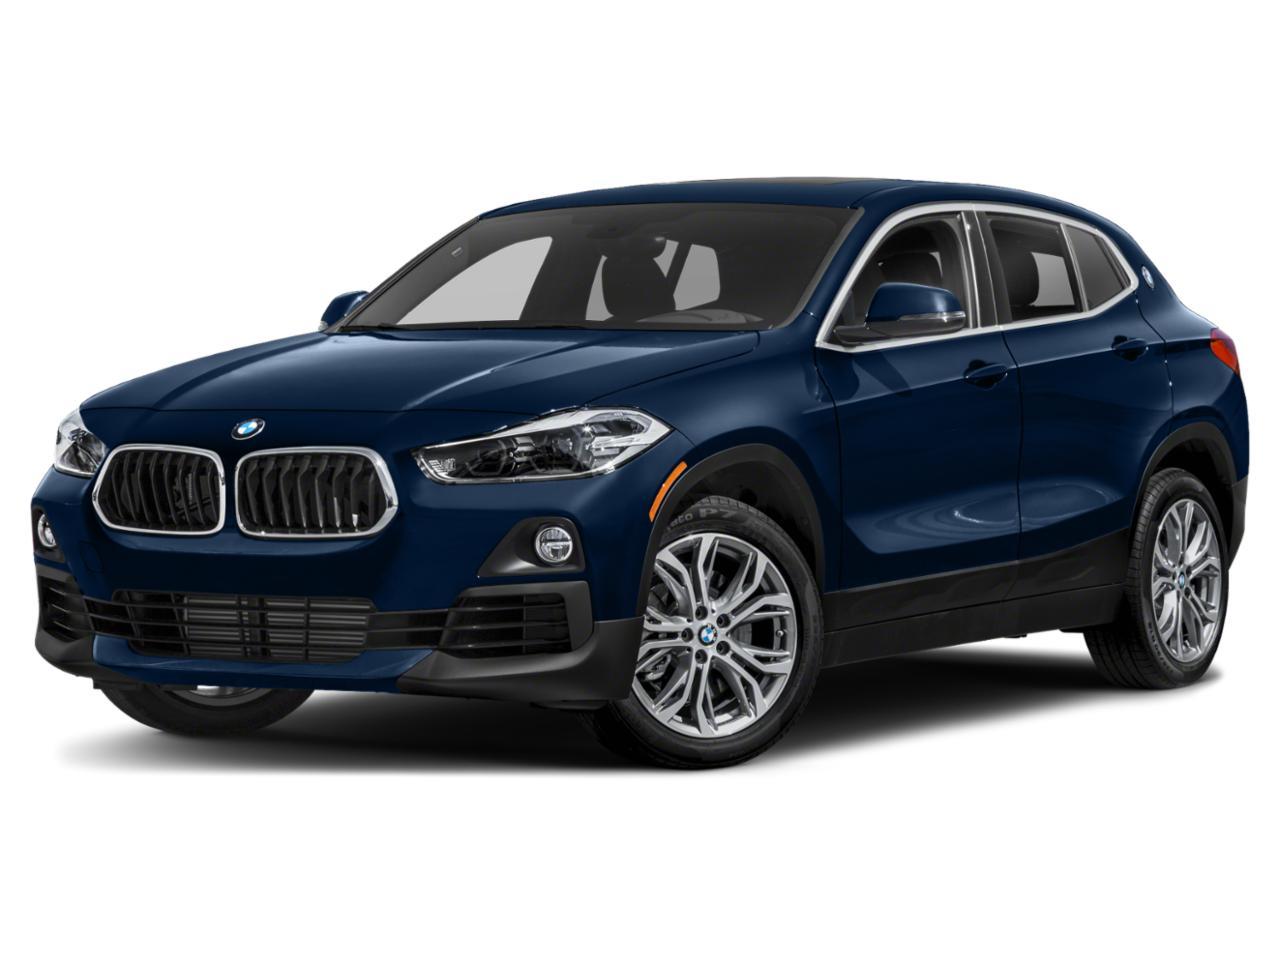 2018 BMW X2 sDrive28i Vehicle Photo in Tucson, AZ 85705